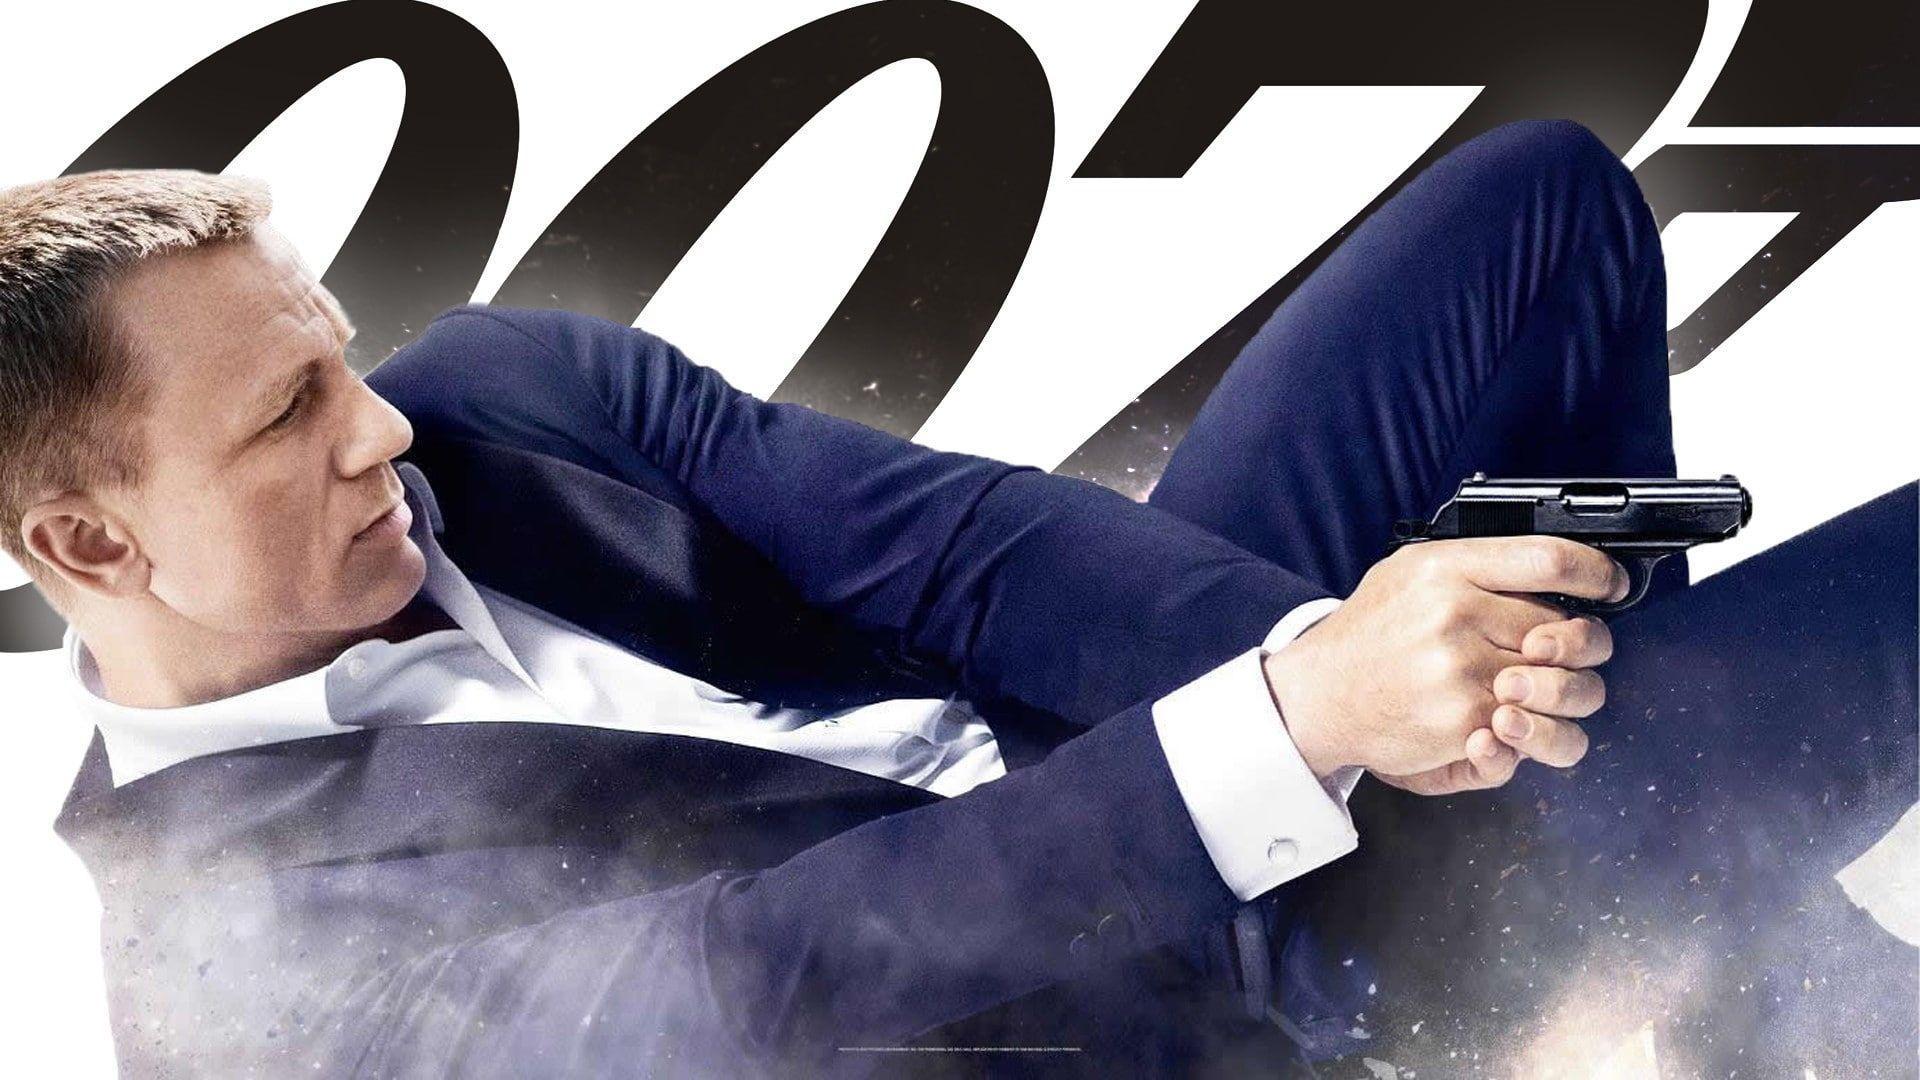 007 James Bond Skyfall Daniel Craig Movies 1080p Wallpaper Hdwallpaper Desktop Daniel Craig Skyfall James Bond Movies